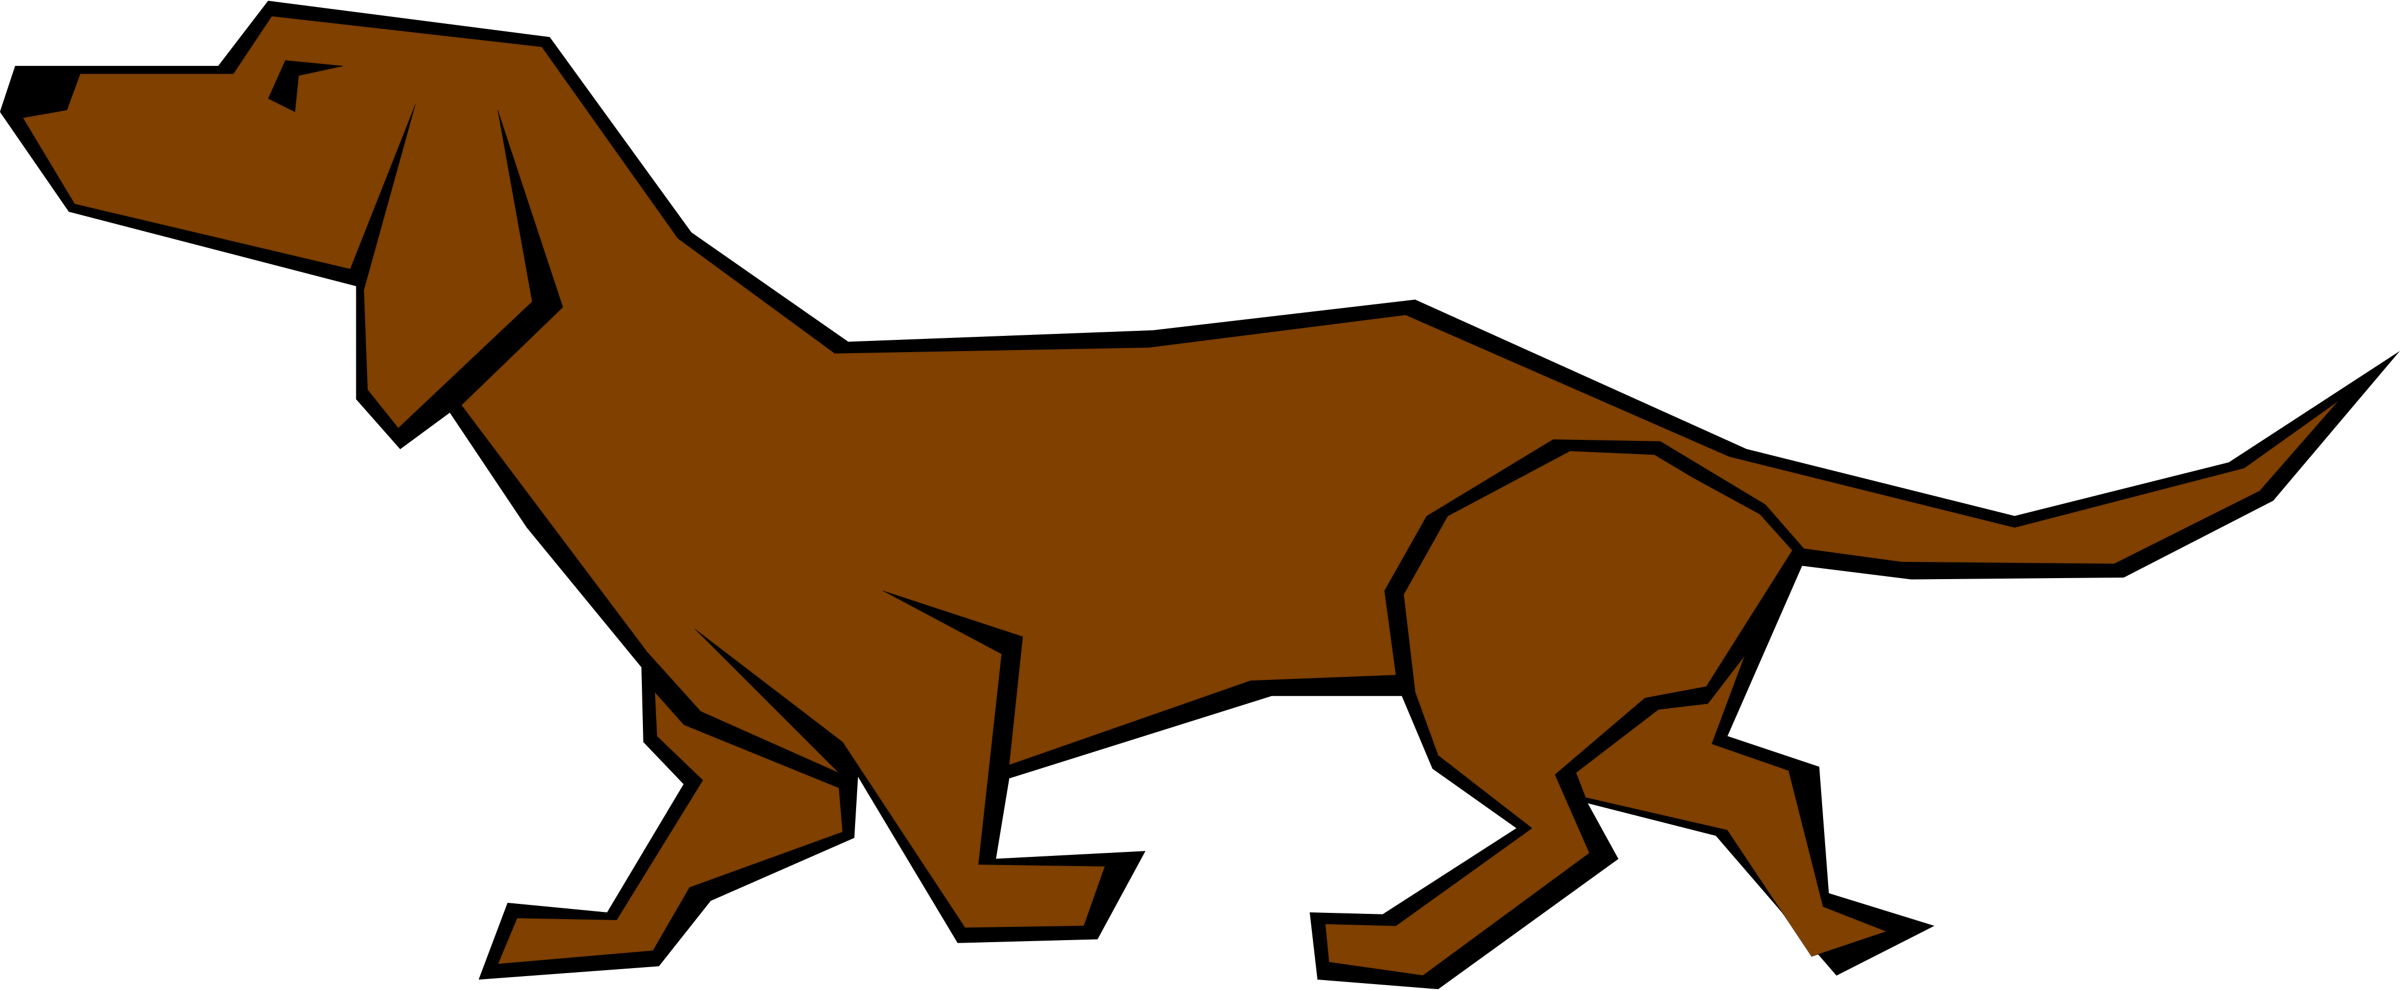 2400x990 Collection Of Free Bulldog Drawing Cartoon Character Download